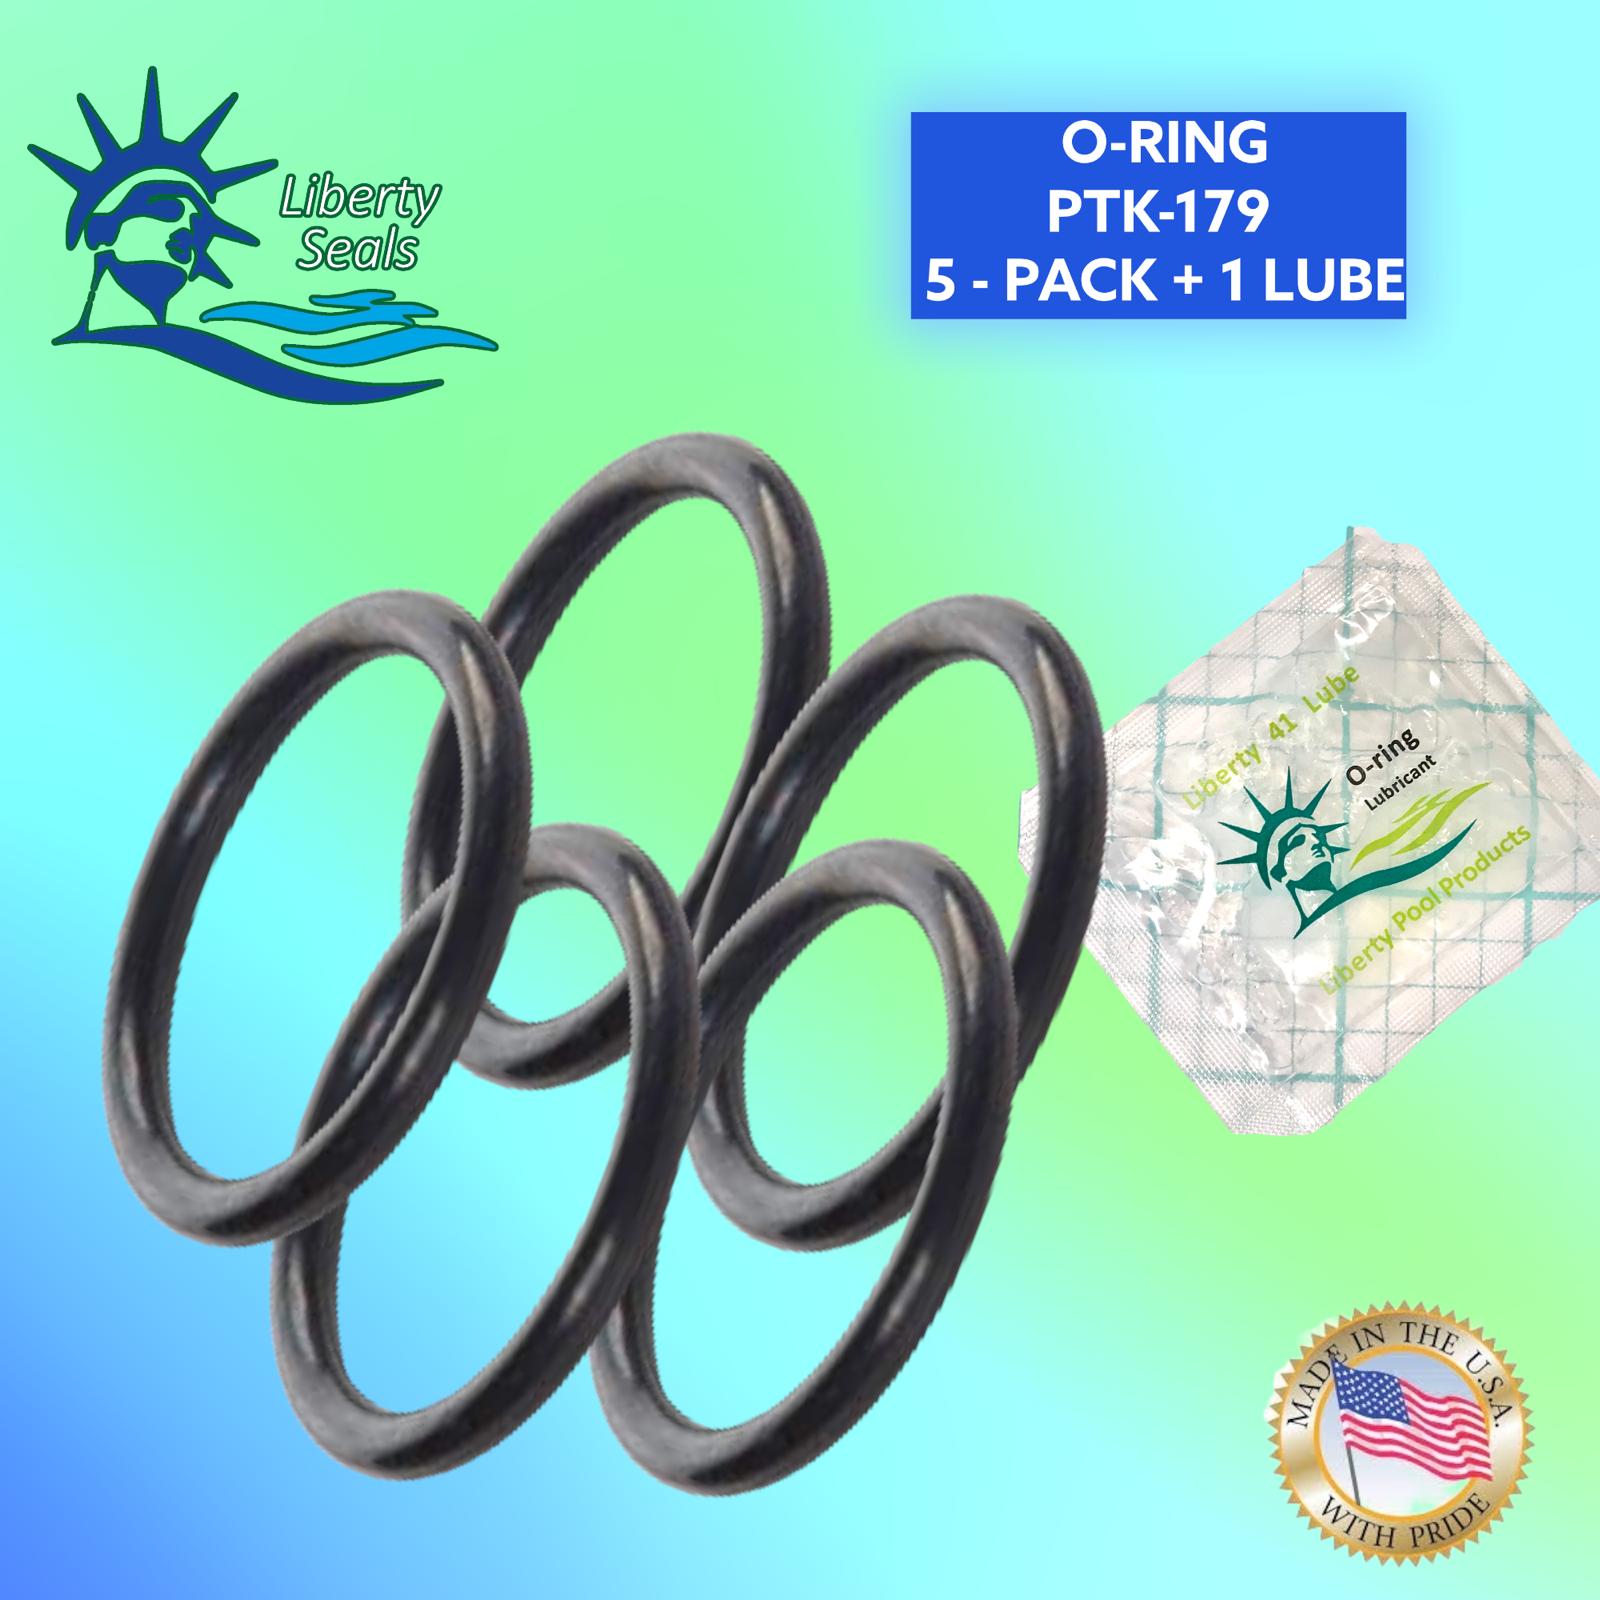 (5-PACK) PTK-179. Caretaker (1-13-3) Union O-ring Floor Cleaner System